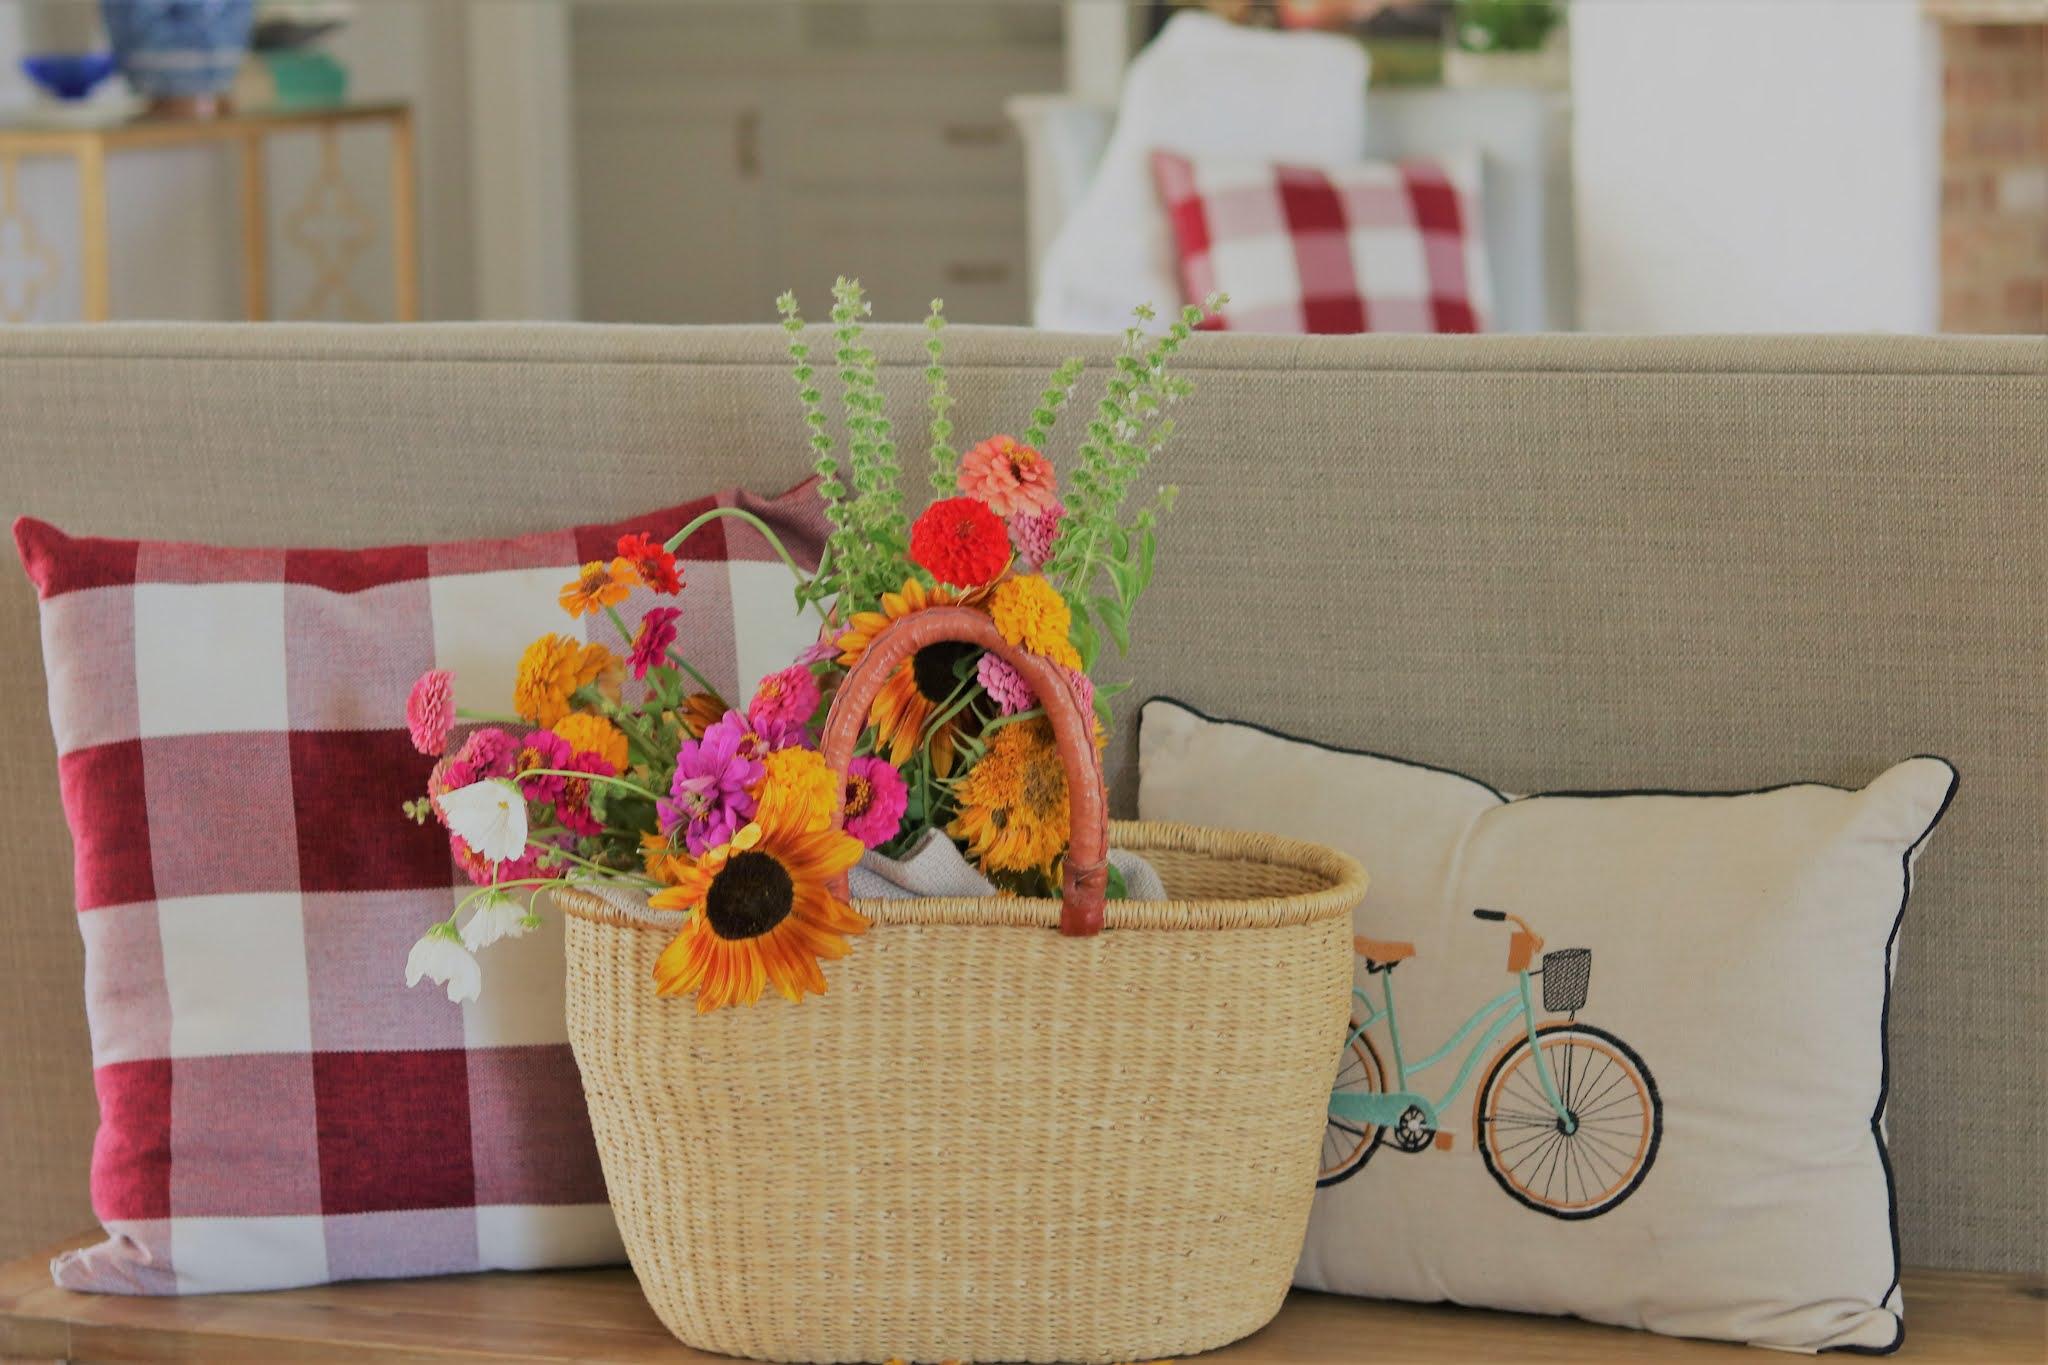 plaid-baskets-flowers-summer-farm-southern-athomewithjemma